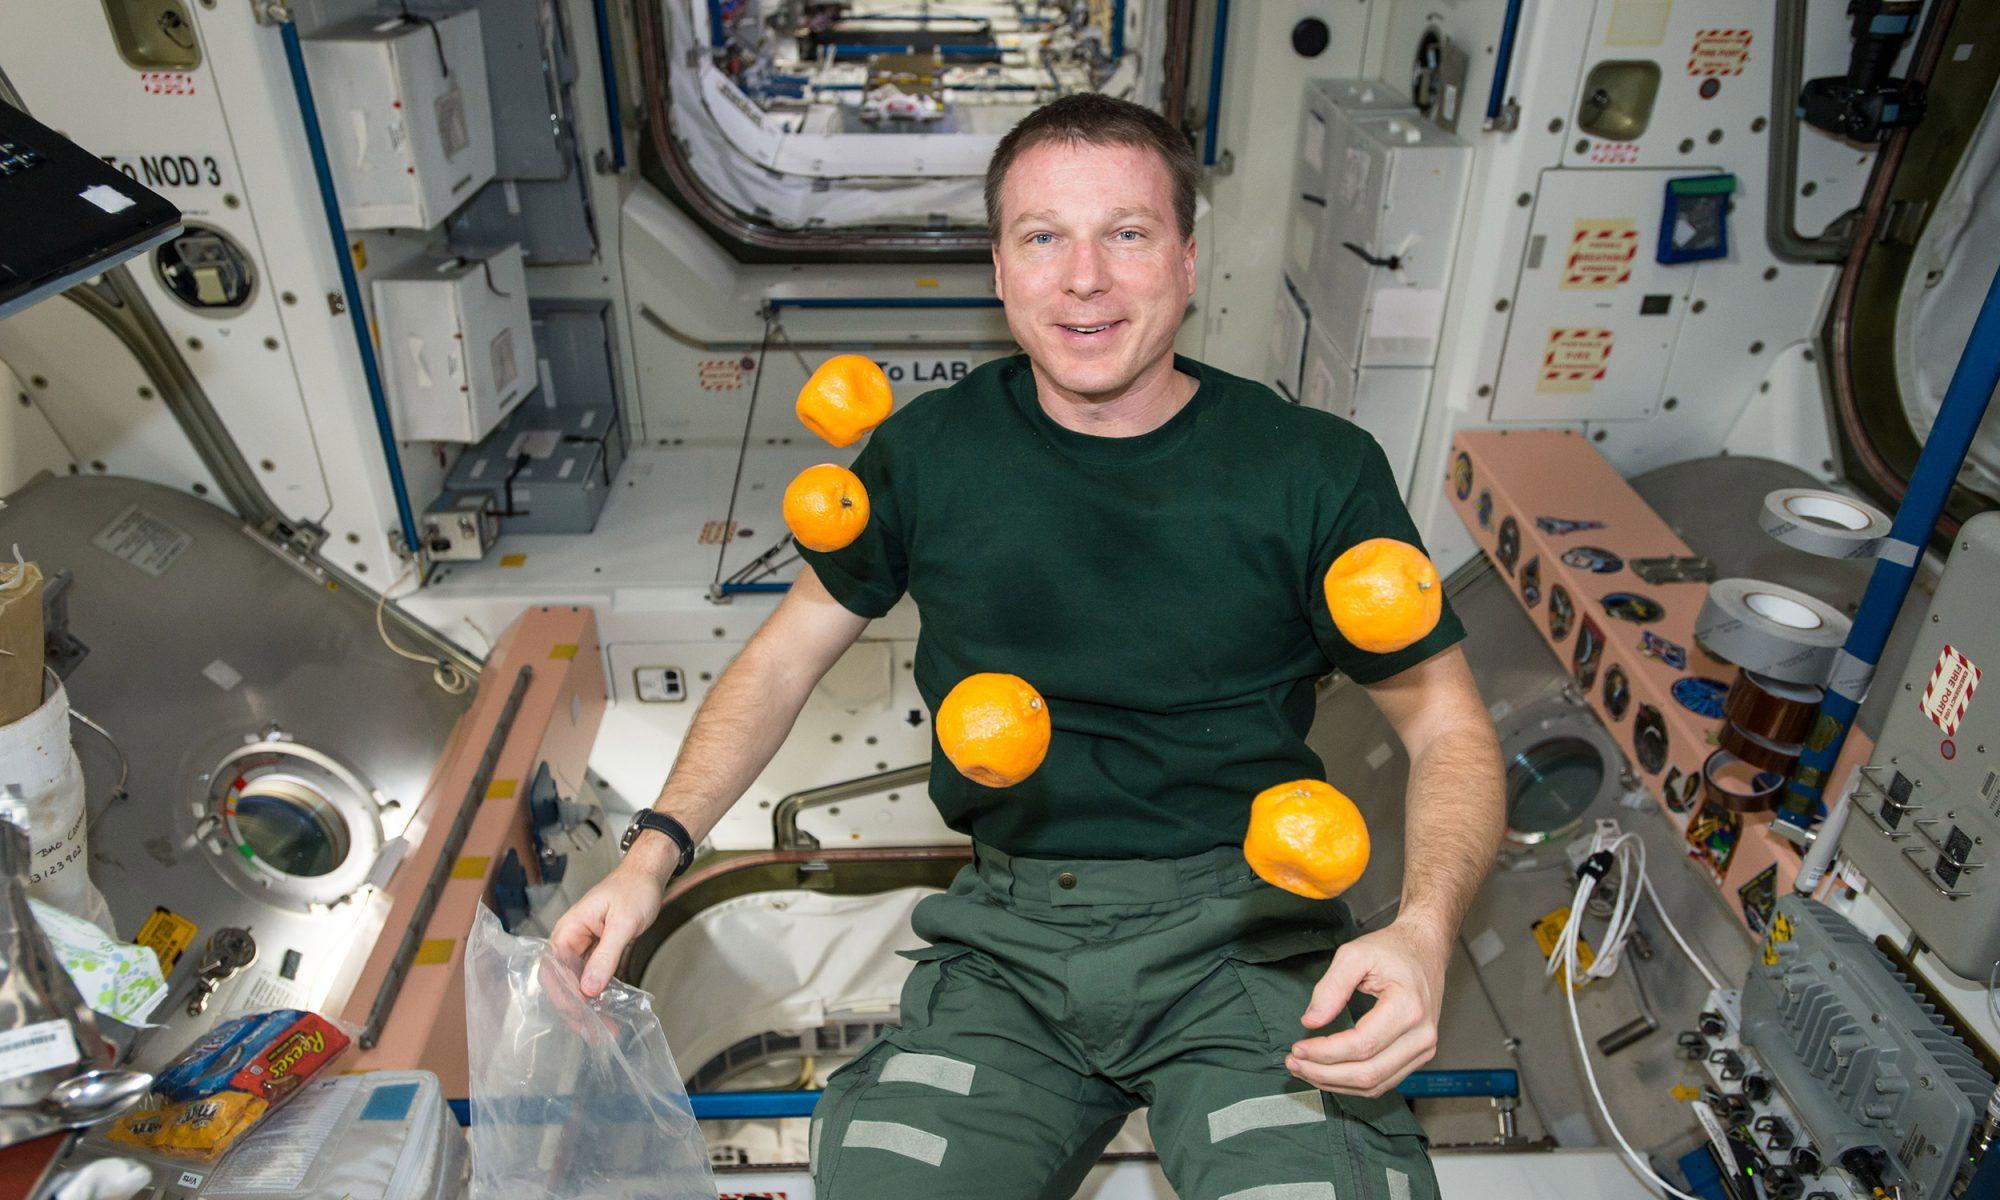 EC: What Do Astronauts Eat for Breakfast?